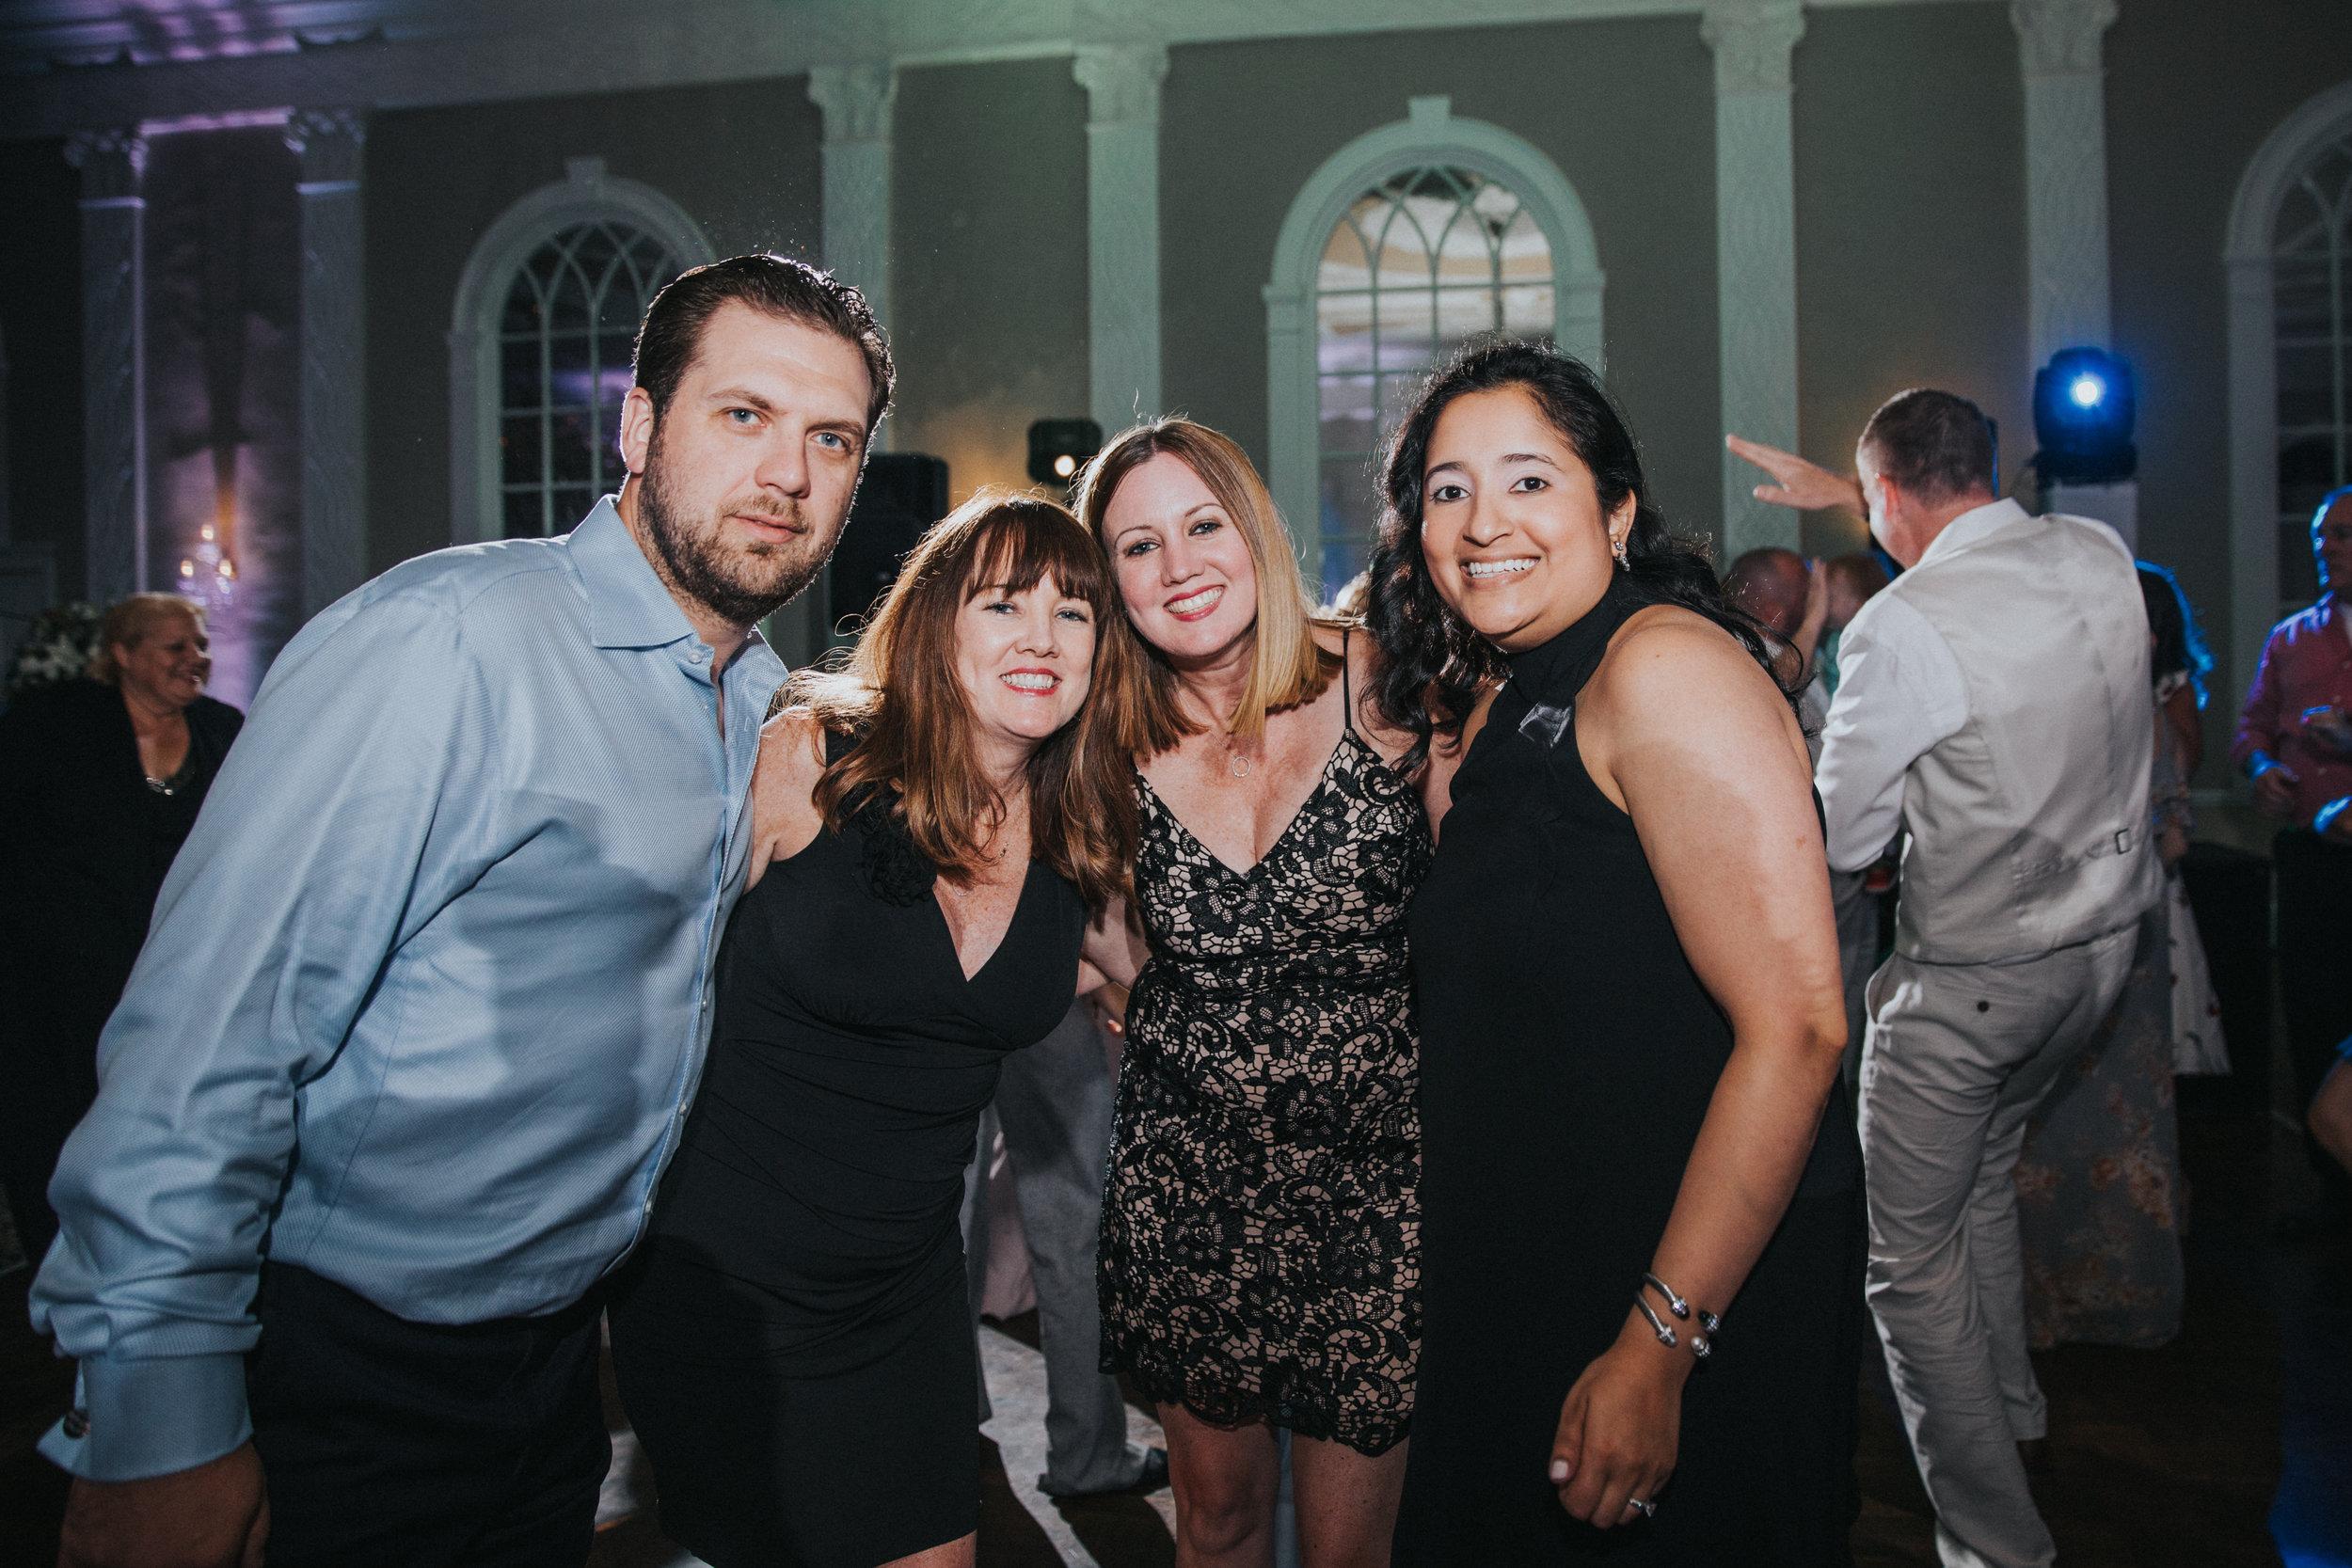 JennaLynnPhotography-NJWeddingPhotographer-Wedding-TheBerkeley-AsburyPark-Allison&Michael-Reception-131.jpg